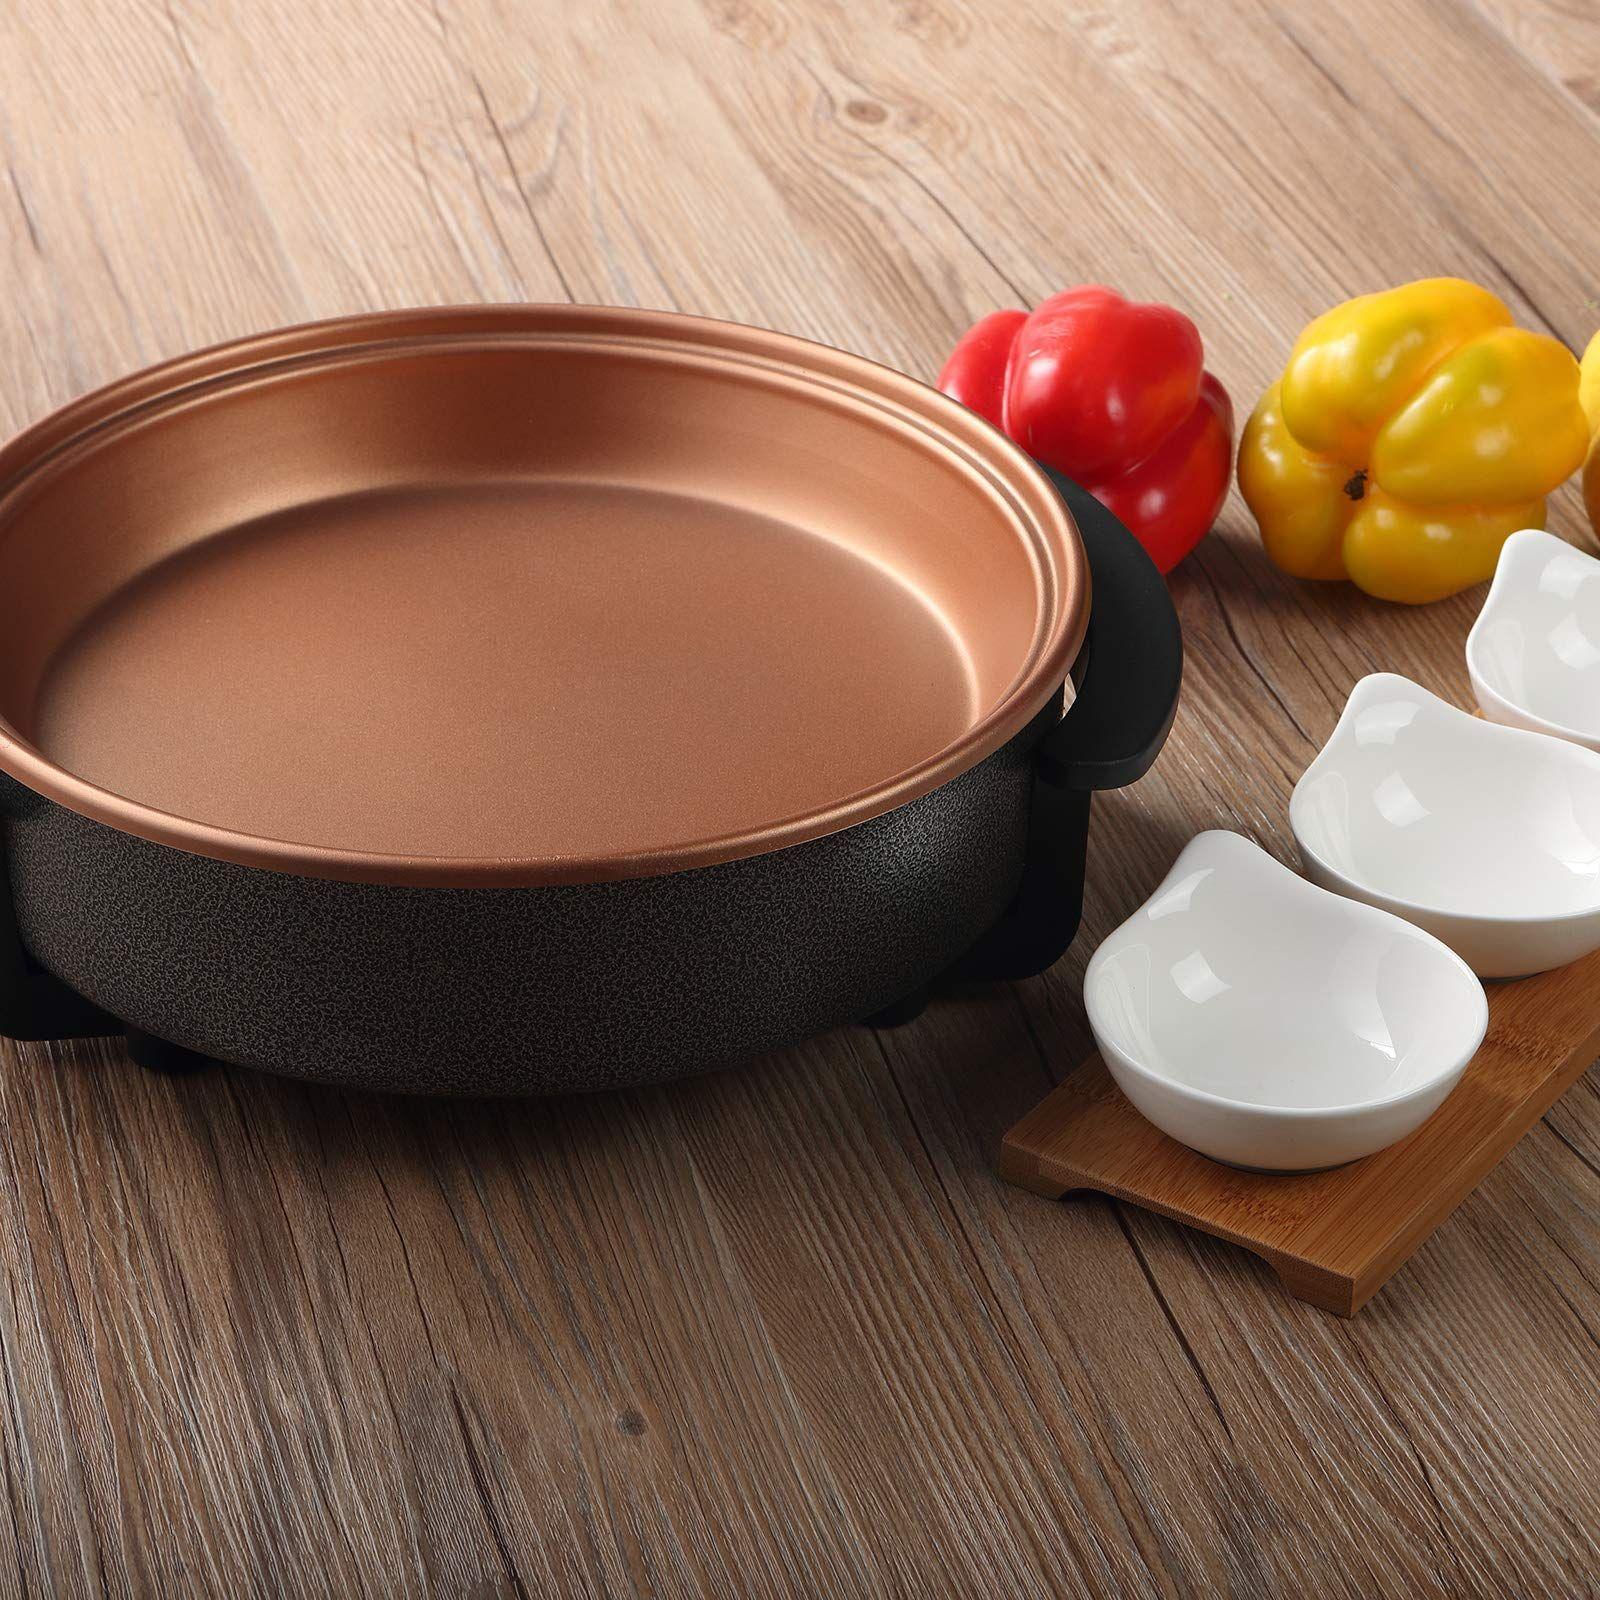 Caynel Nonstick Ceramic Copper Electric Skillet 12 Inch